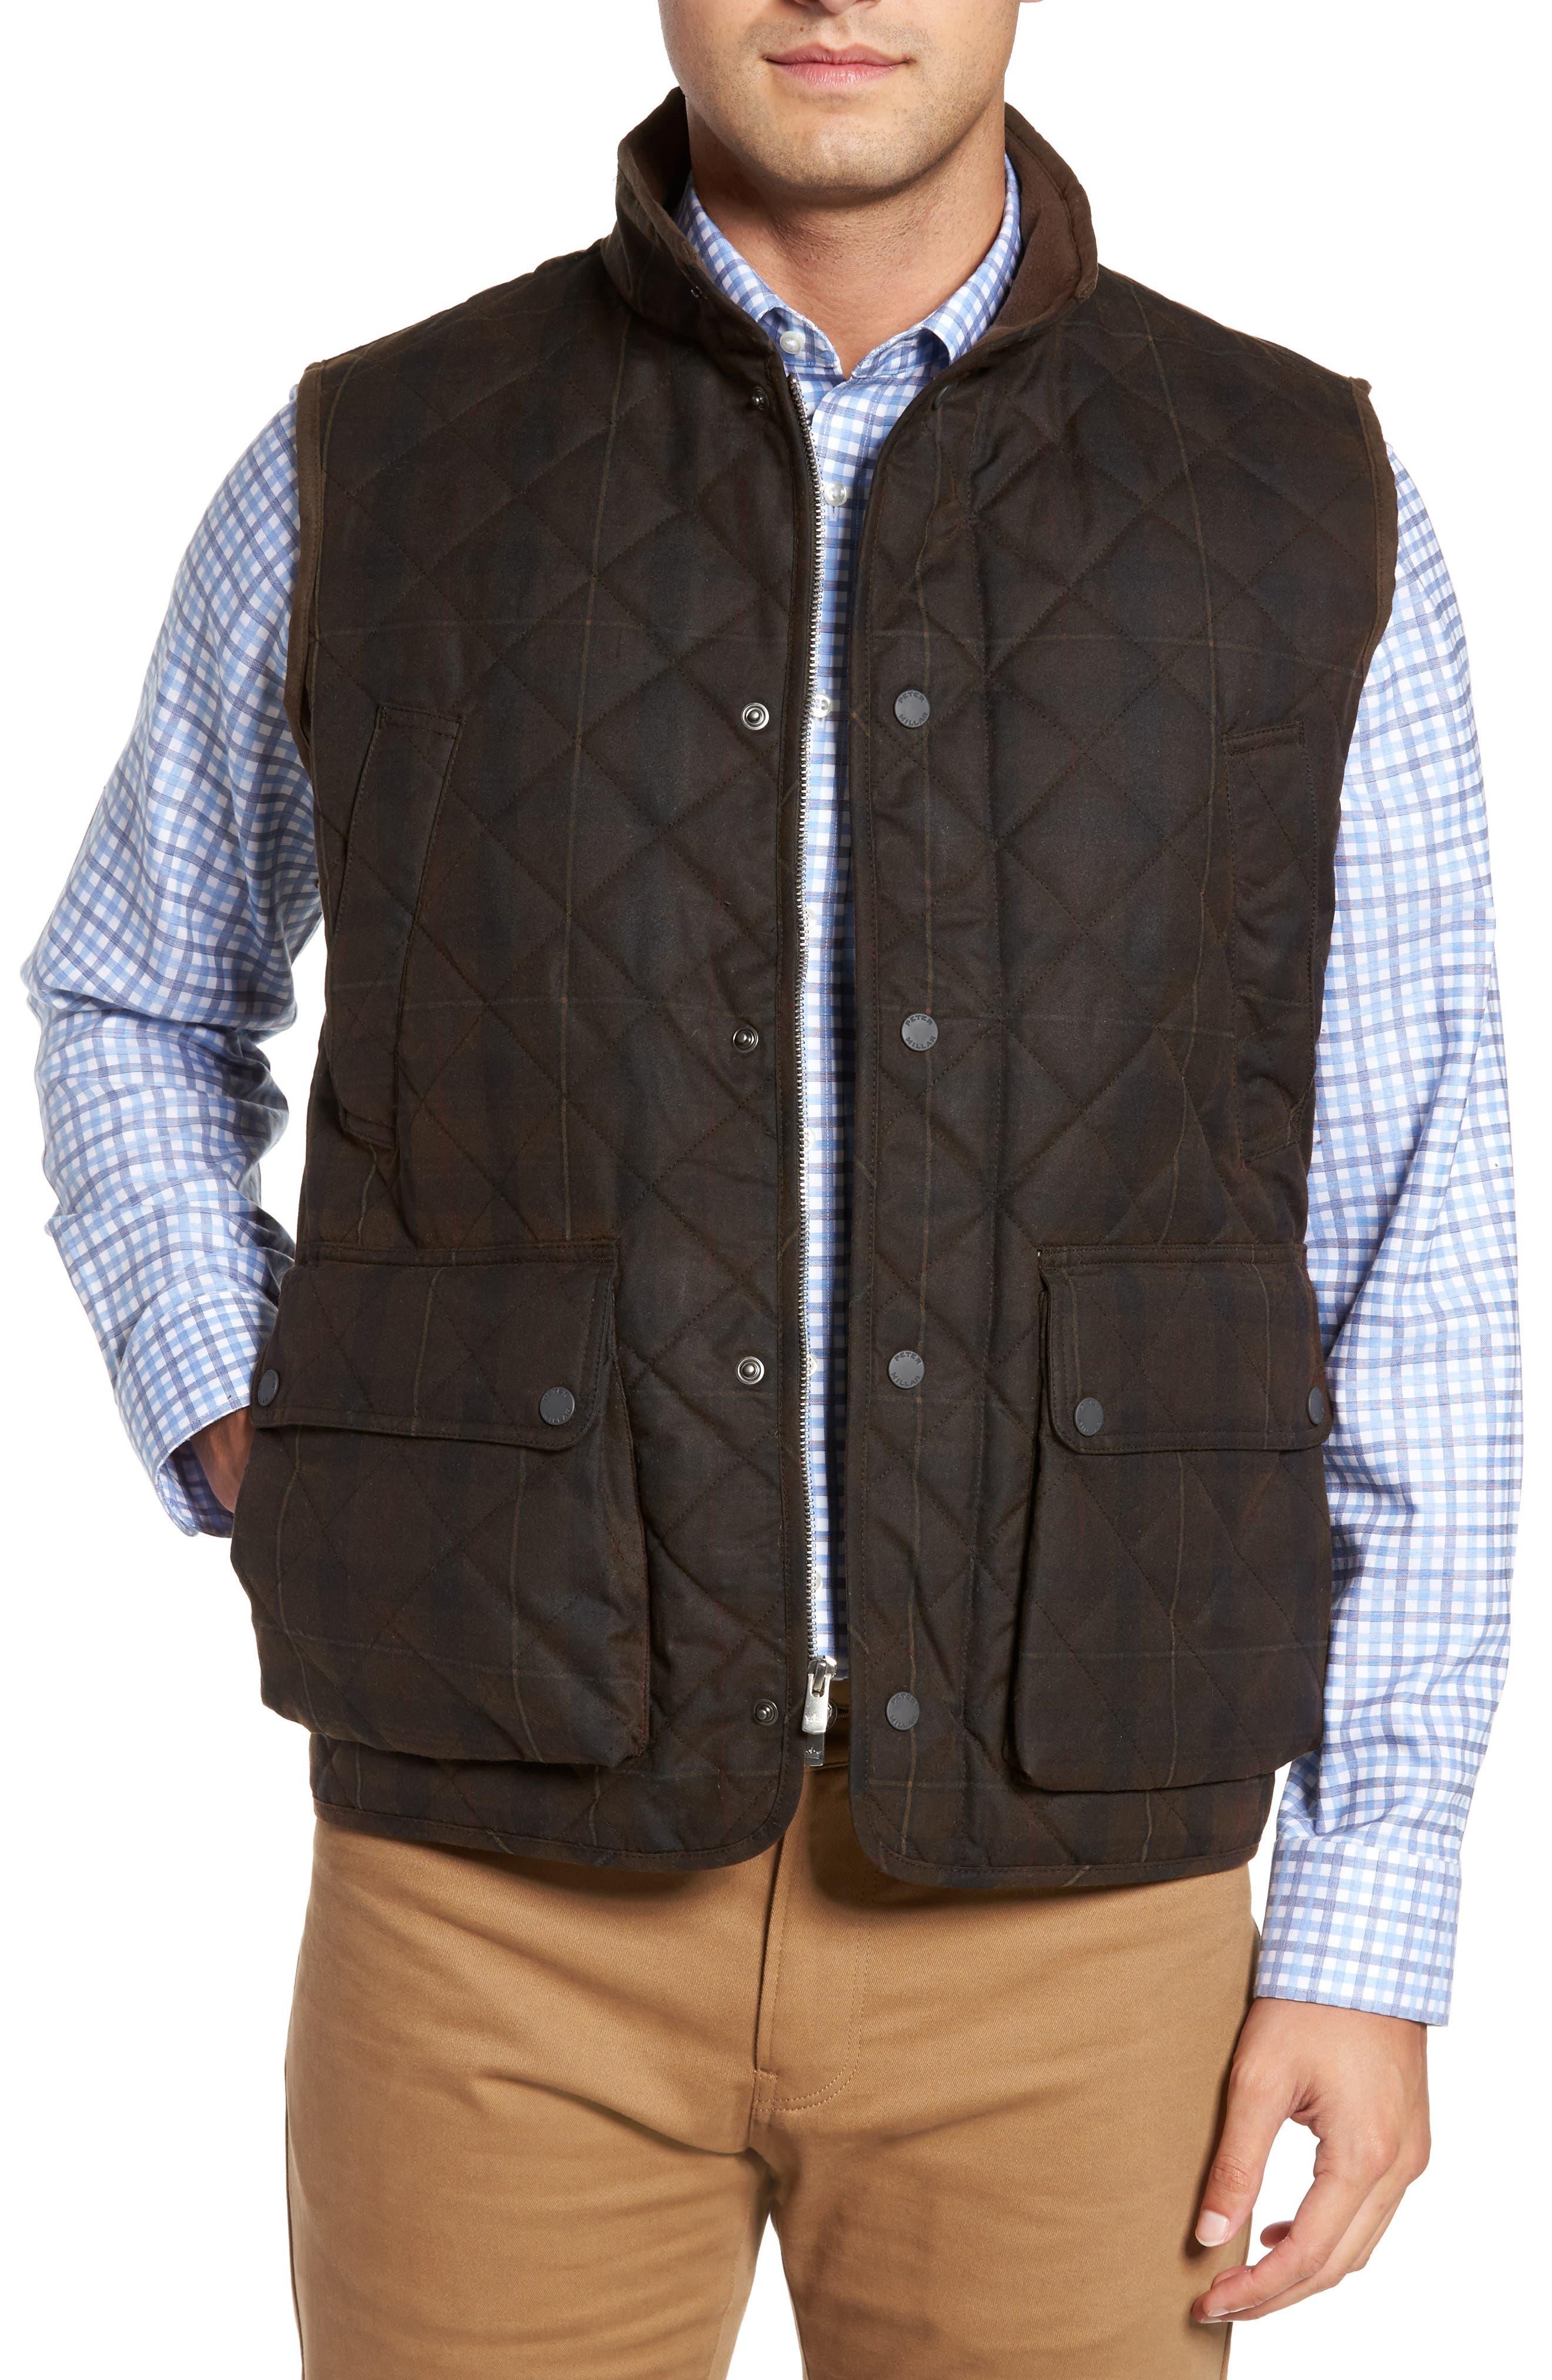 Peter Millar Mountainside Waxed Cotton Vest